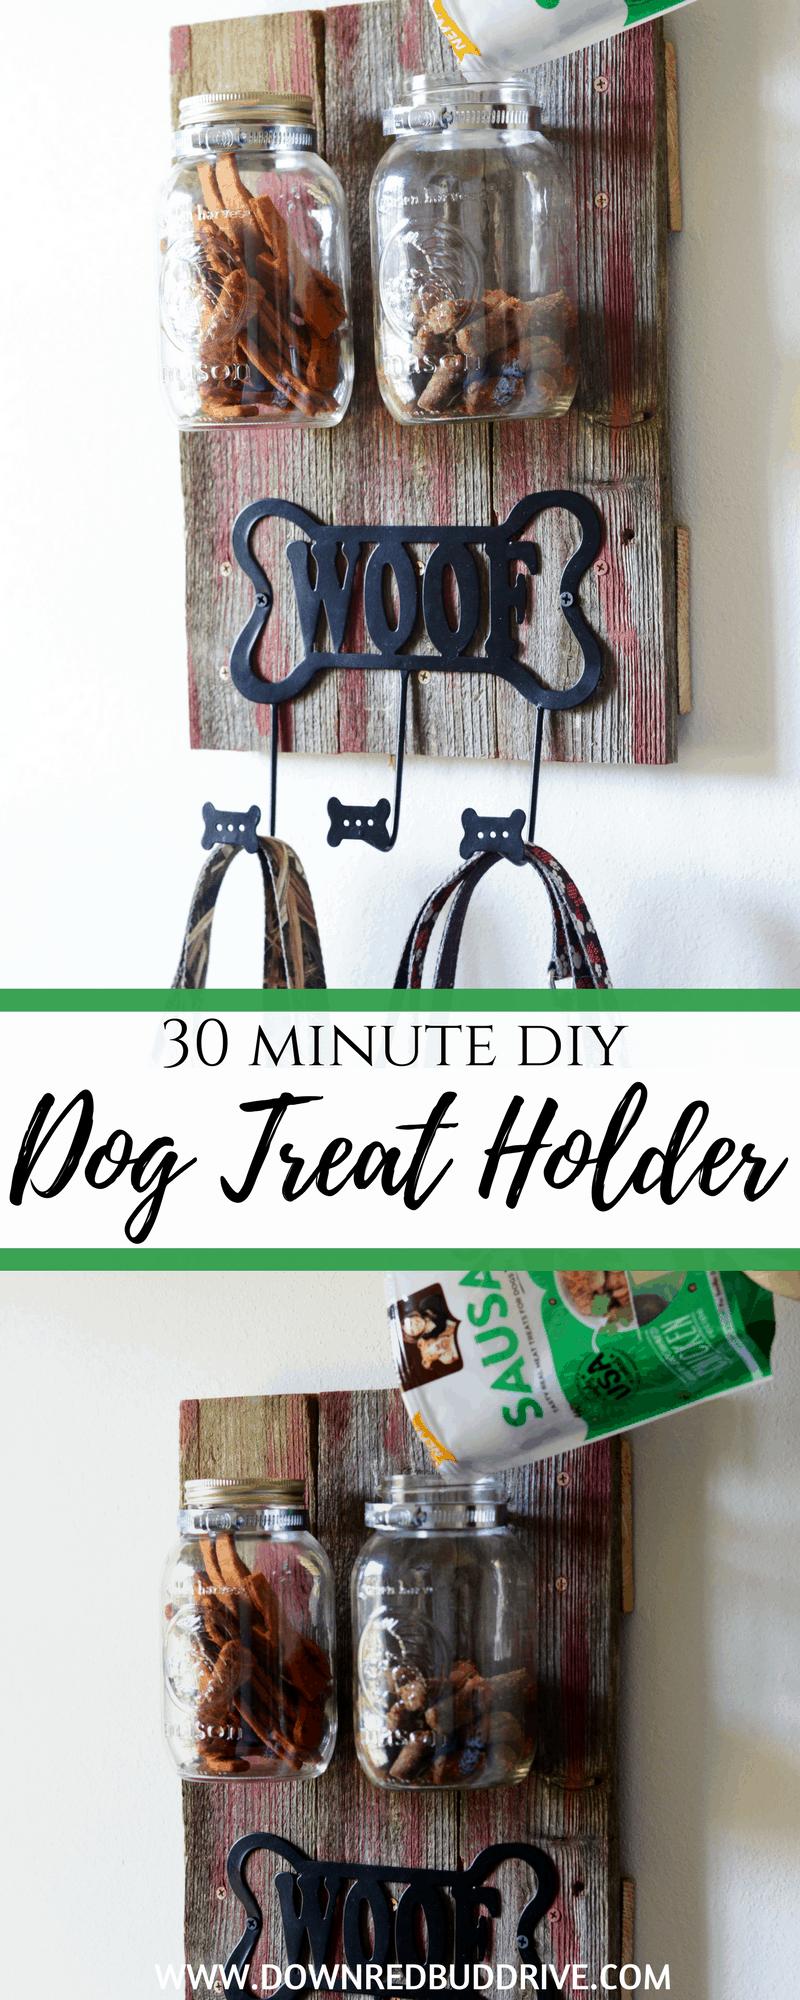 Dog Treat Holder | Dog DIY | Pet DIY | Dog Organizer | Pet Organization | DIY Leash Holder | Dogs | Down Redbud Drive | #dogdiy #petdiy #ad #NutrishRealMeatTreats #NutrishPets @NutrishForPets